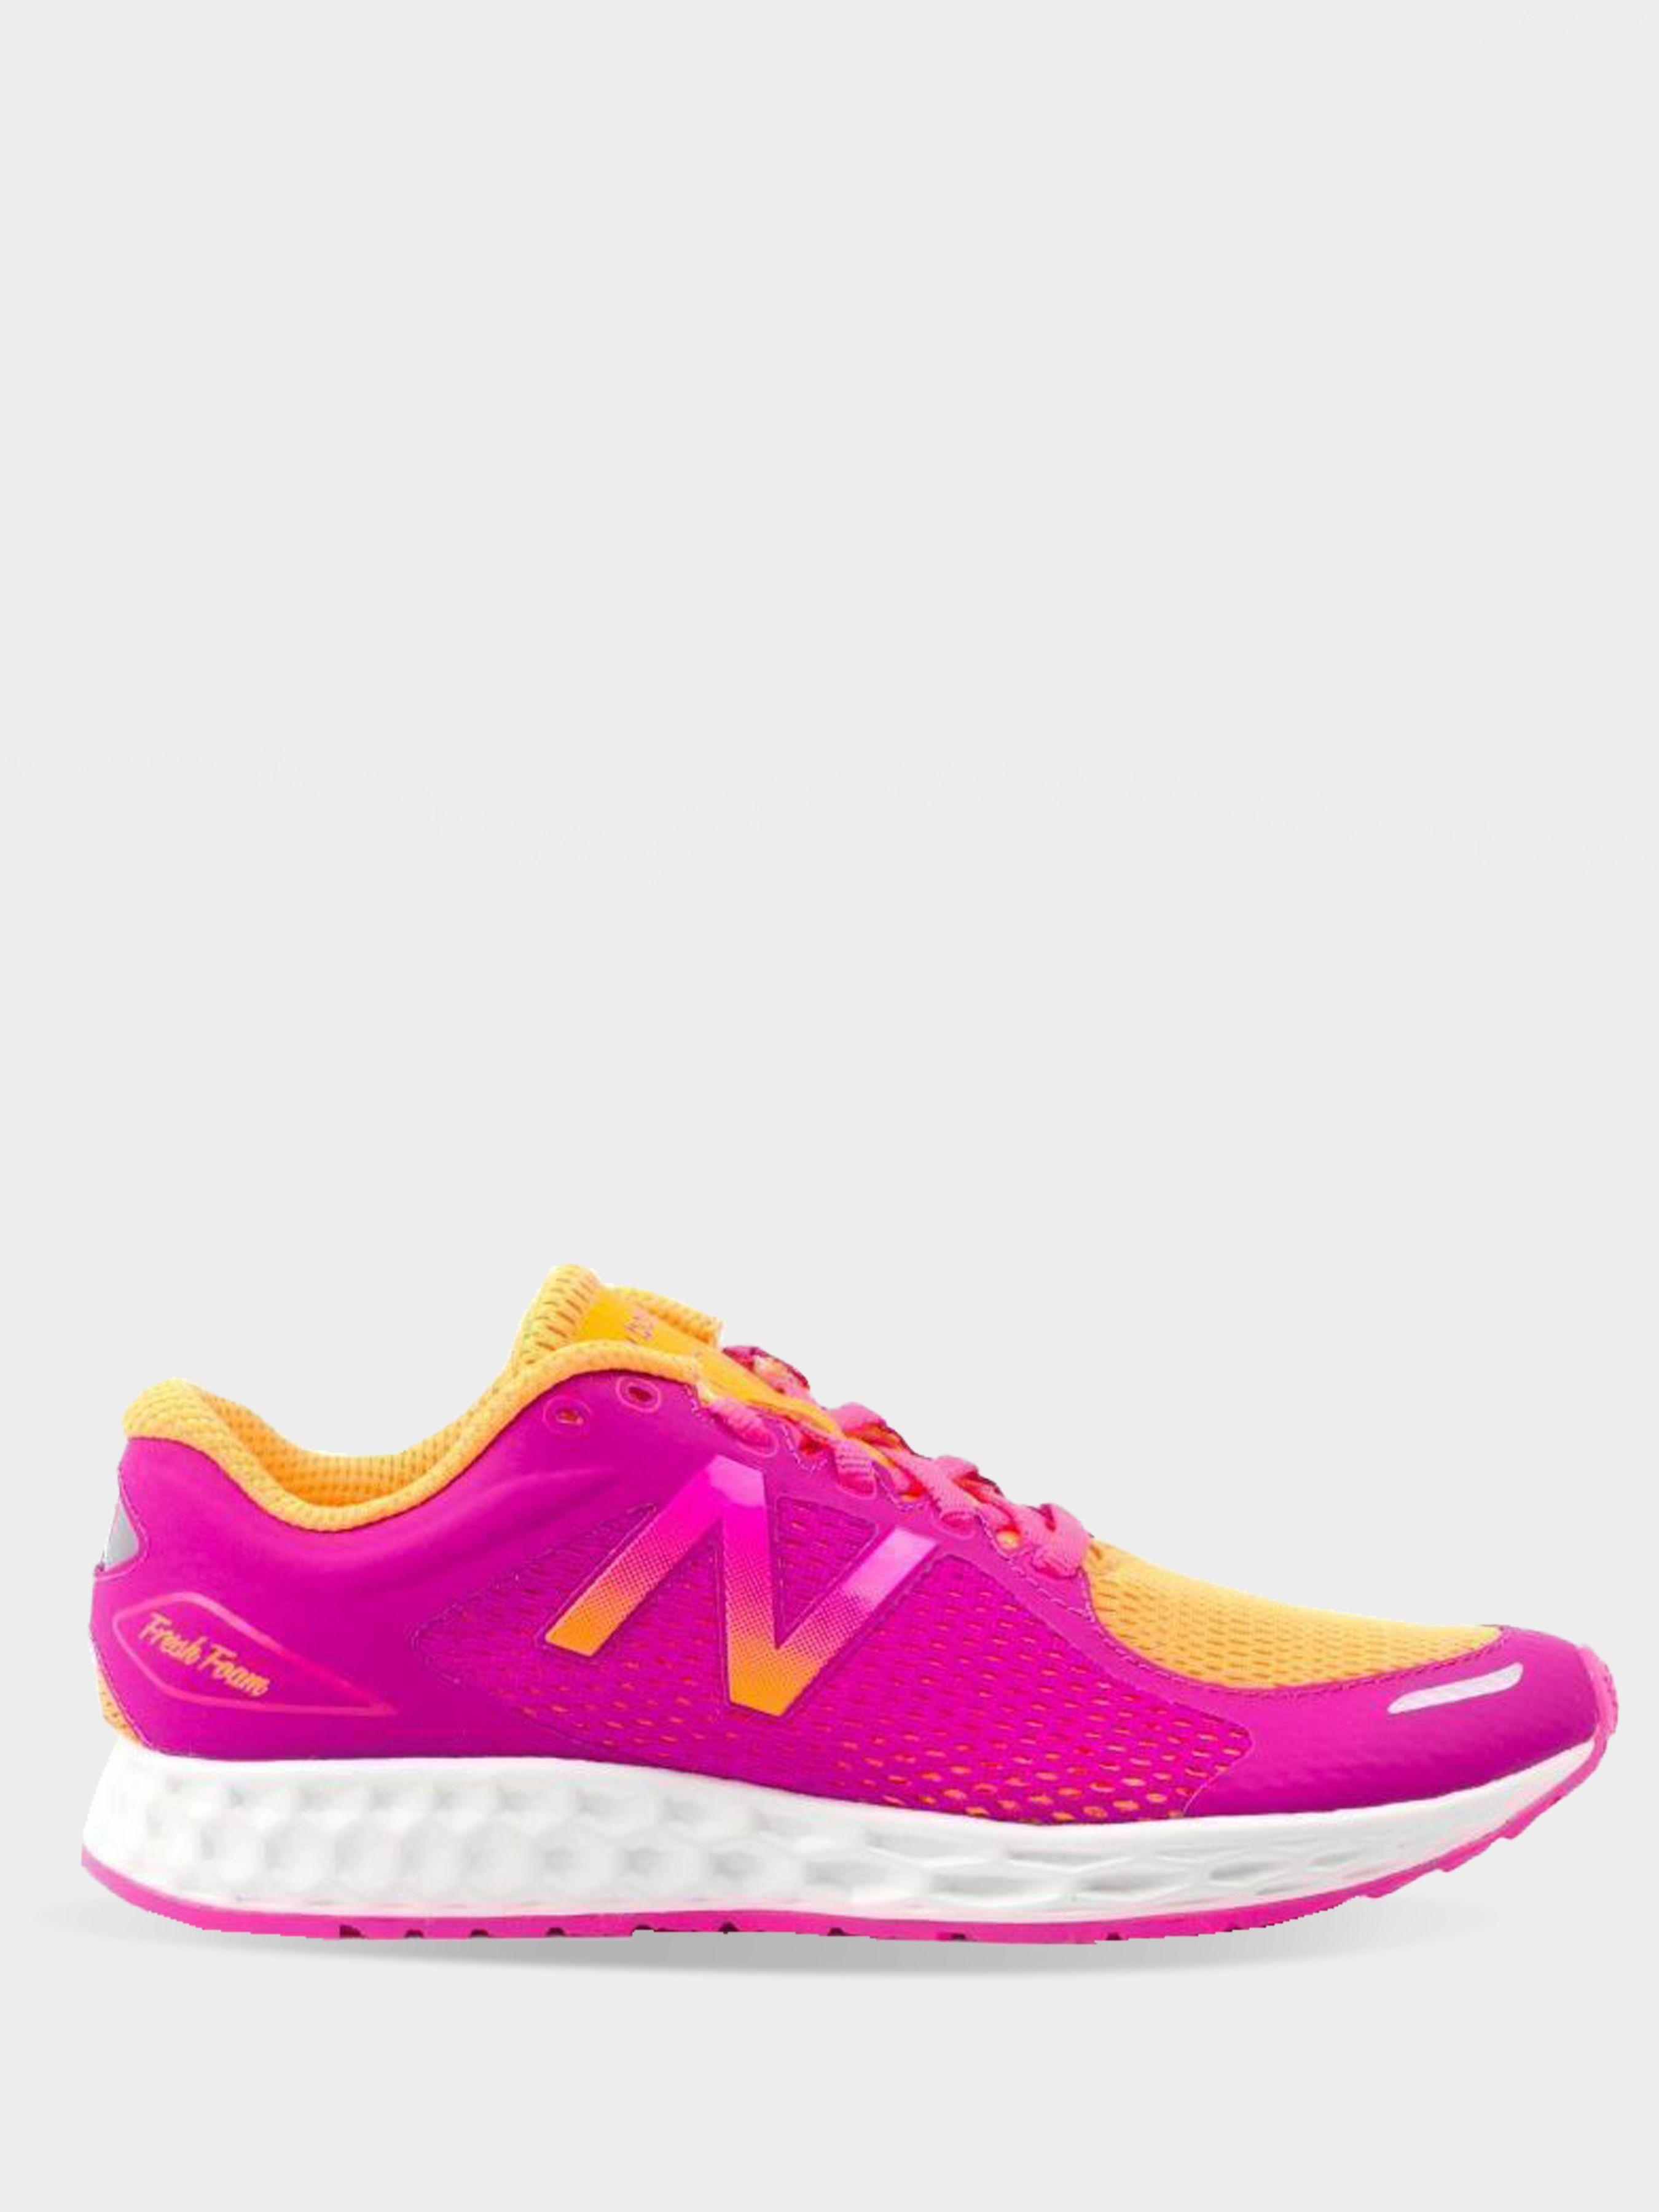 Кроссовки для детей New Balance Zante MU29 продажа, 2017